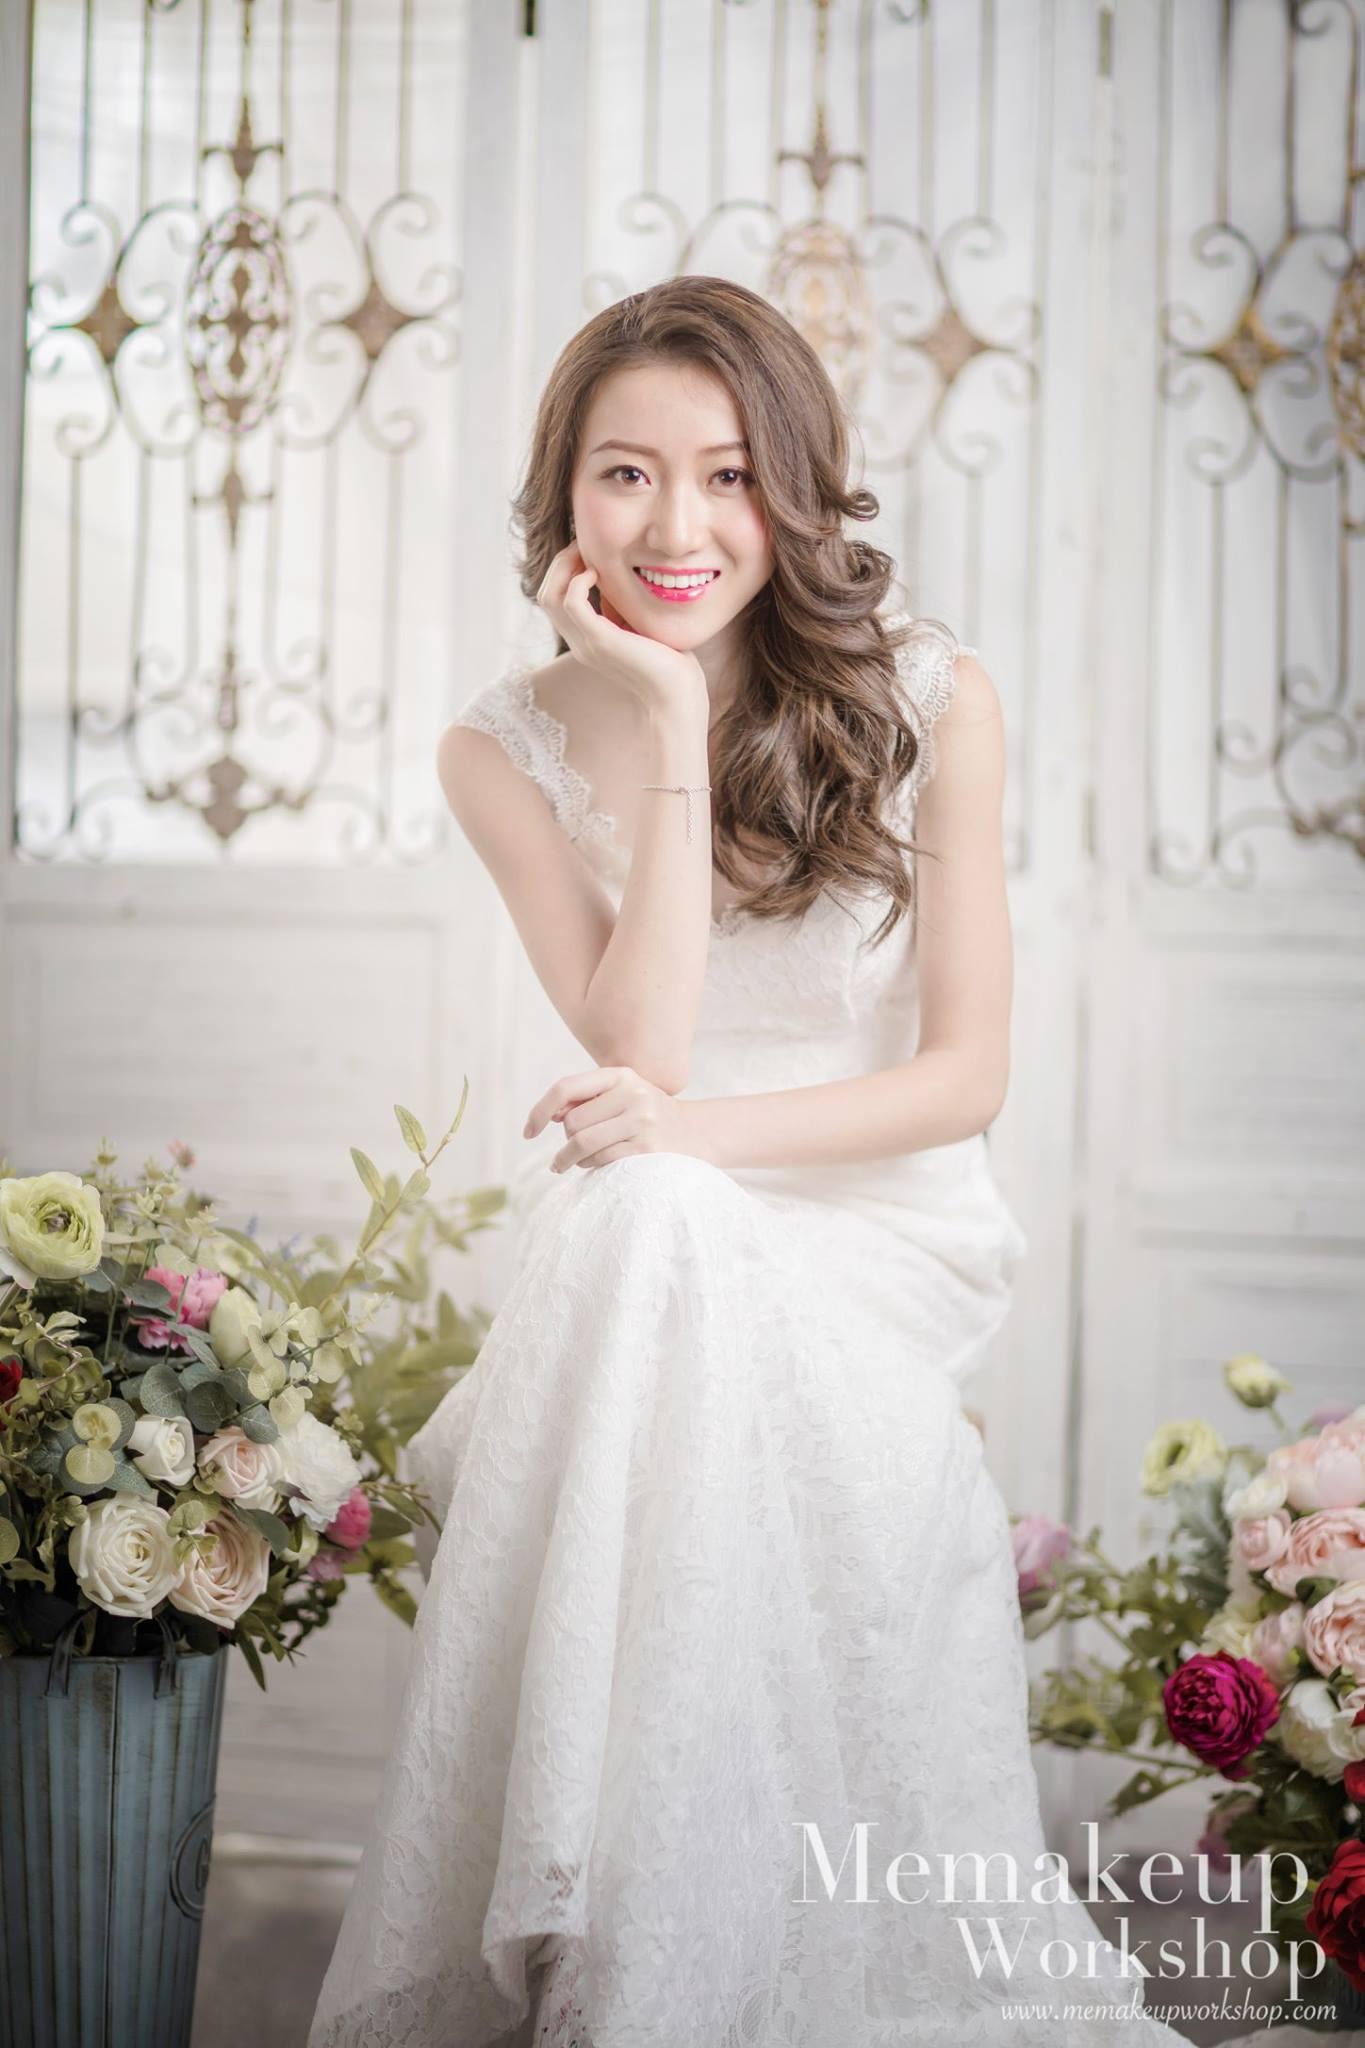 Workshop www.memakeupwoikshop.com,gown,wedding dress,bride,flower,bridal clothing